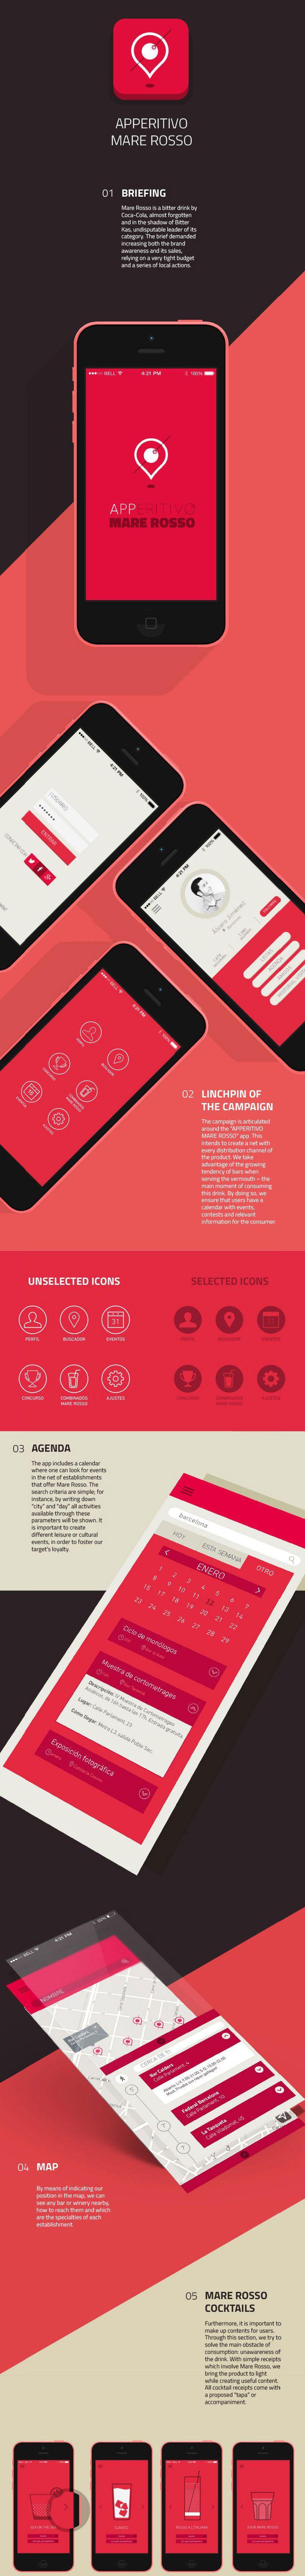 Mare Rosso mobile application design - #ux #ui